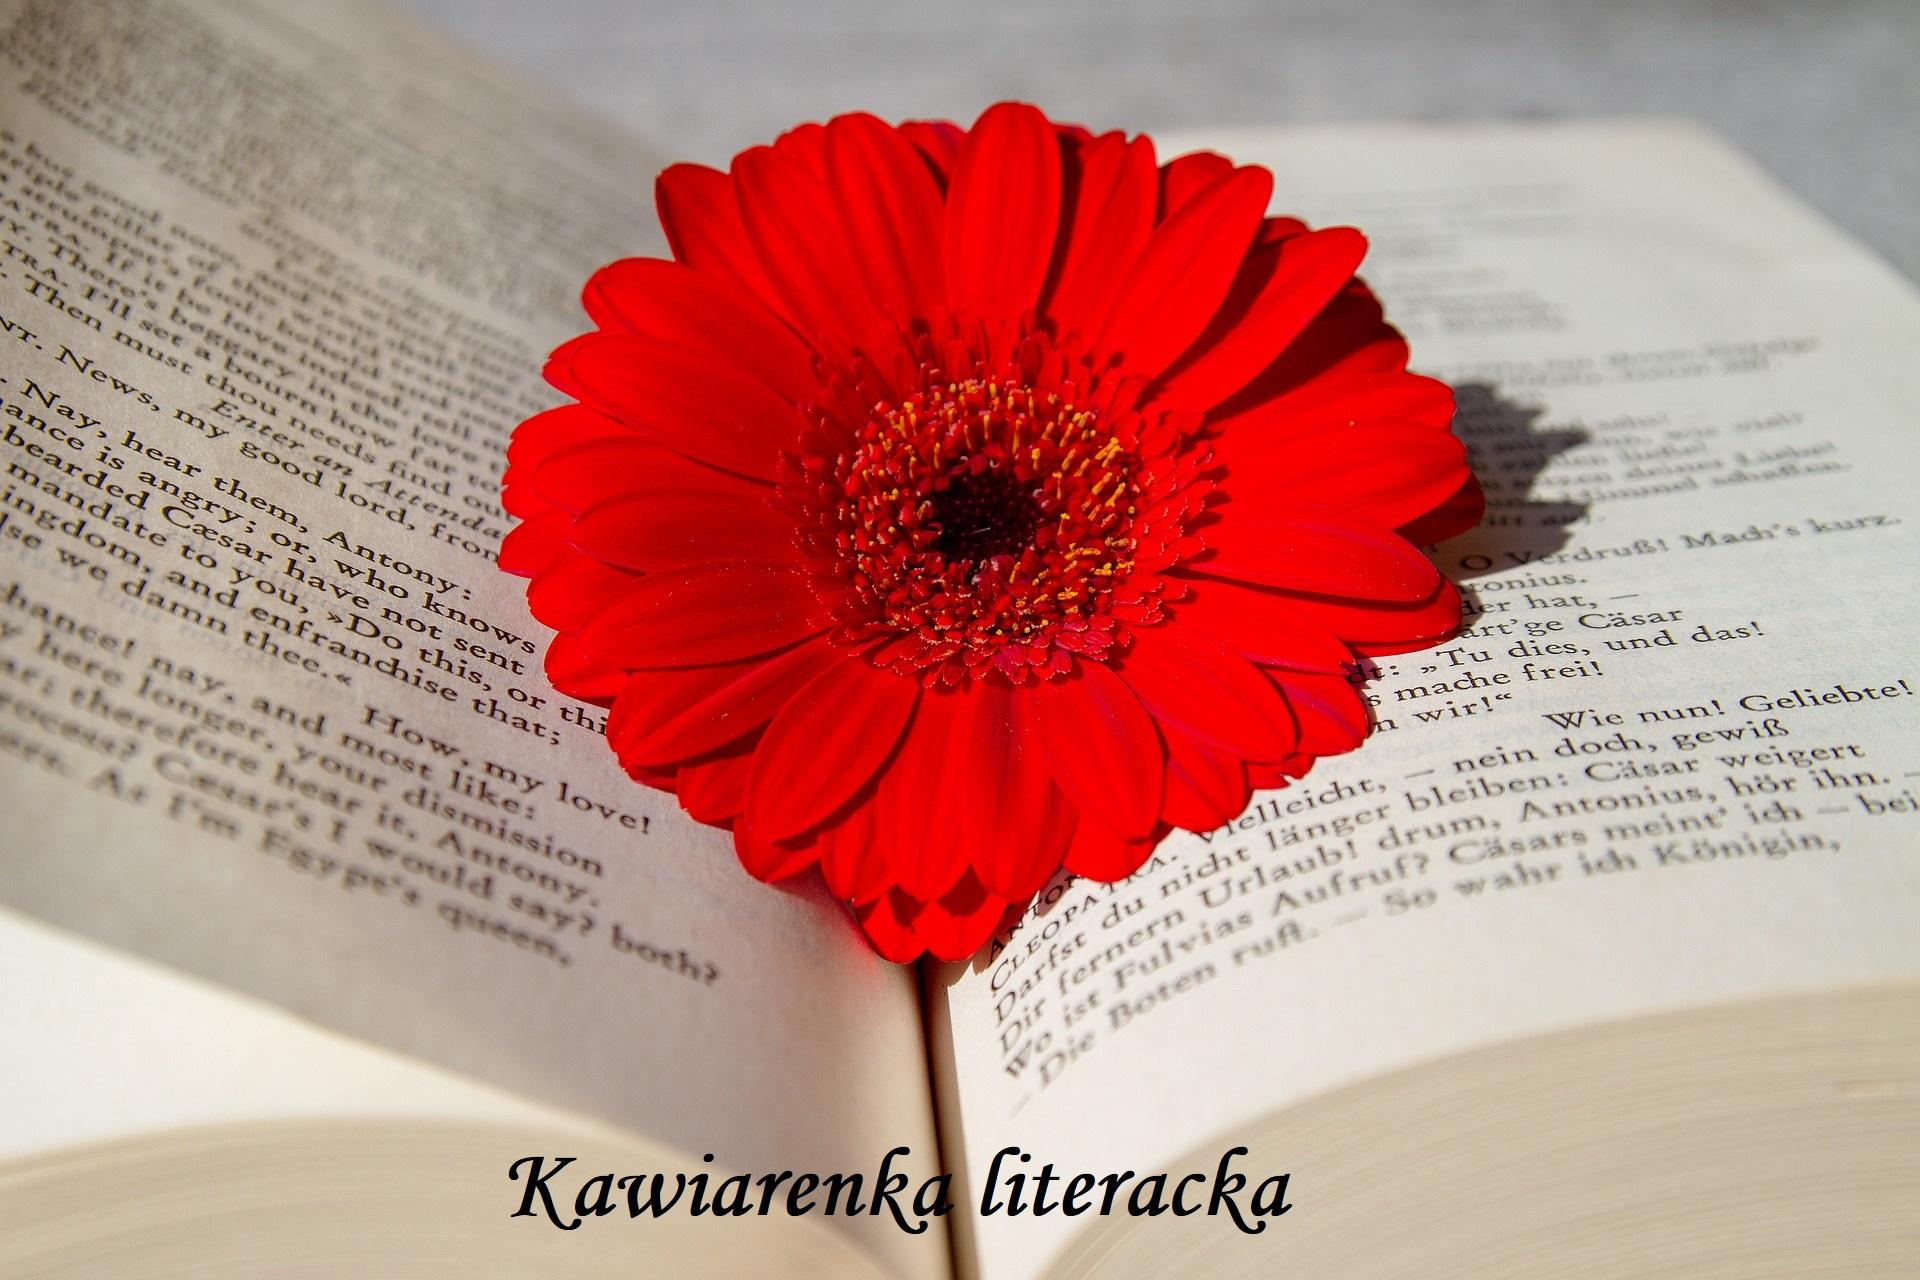 kawiarenka, literatura, kawiarenka literacka